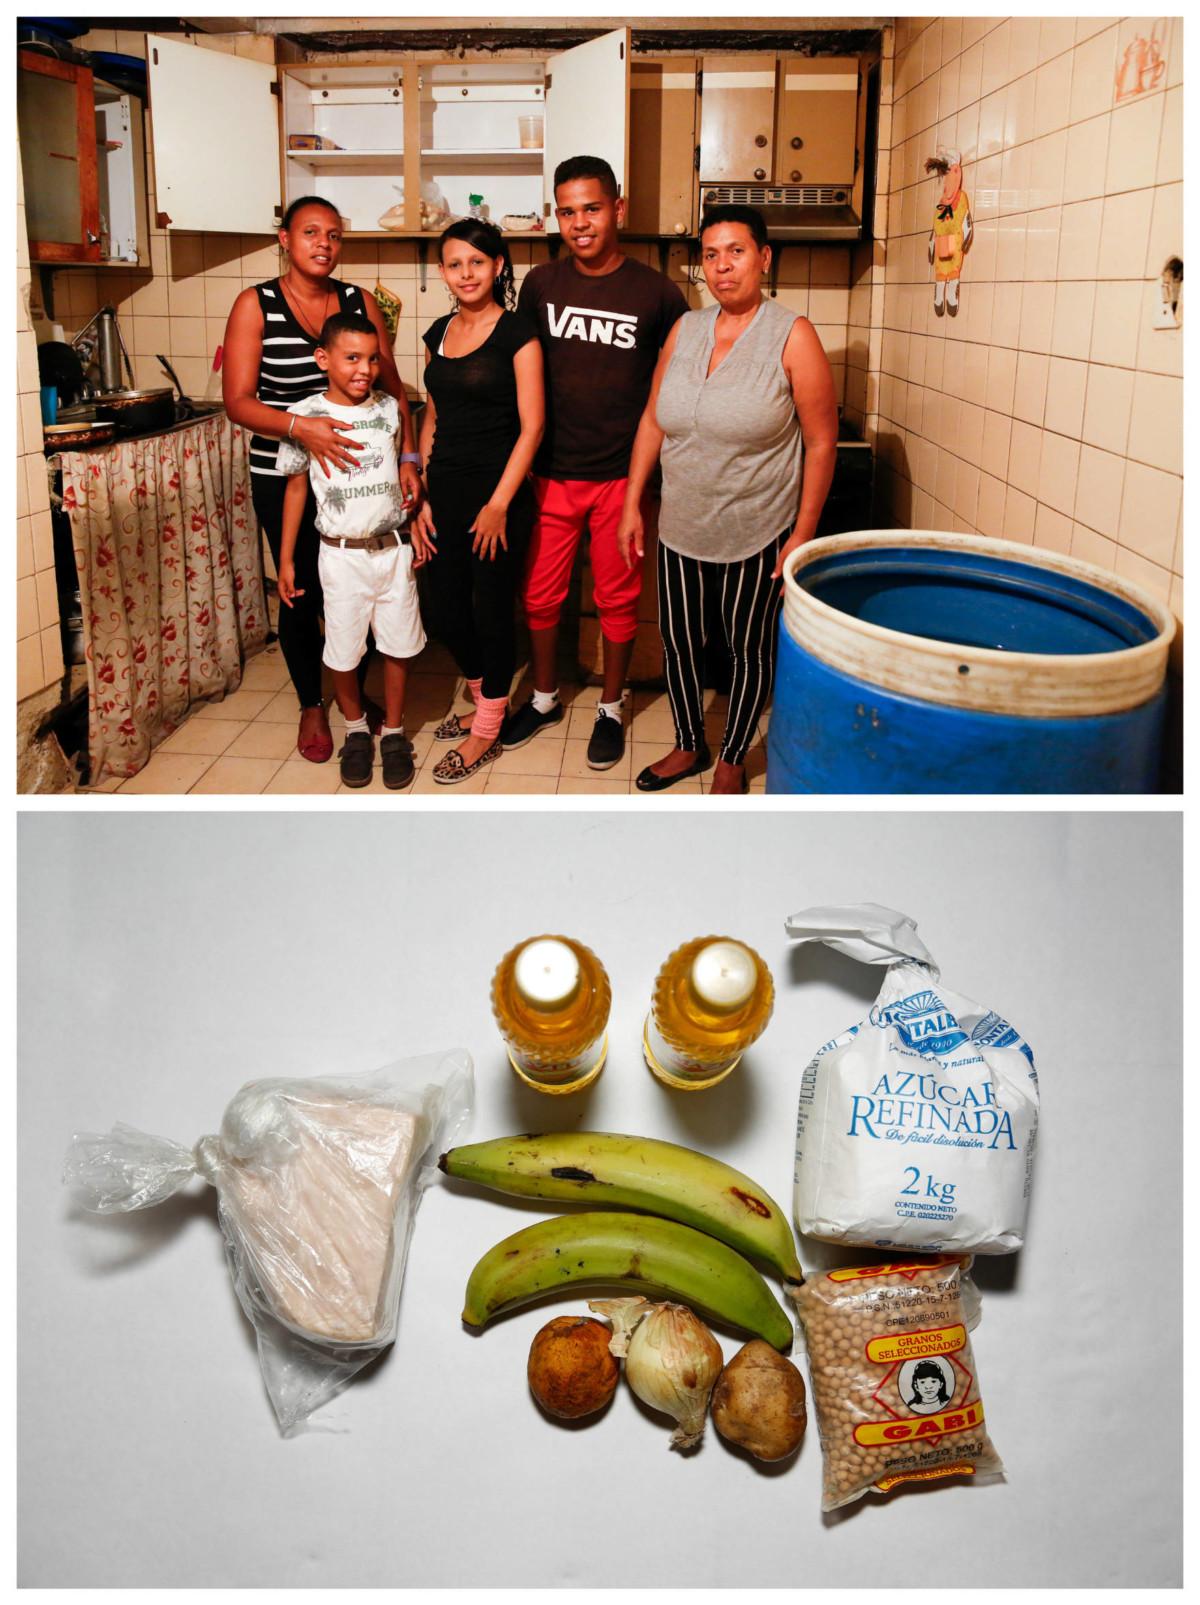 Francisca Landaeta 與親戚:「吃得一日是一日。我們從沒想過會發生這樣差的情況。」